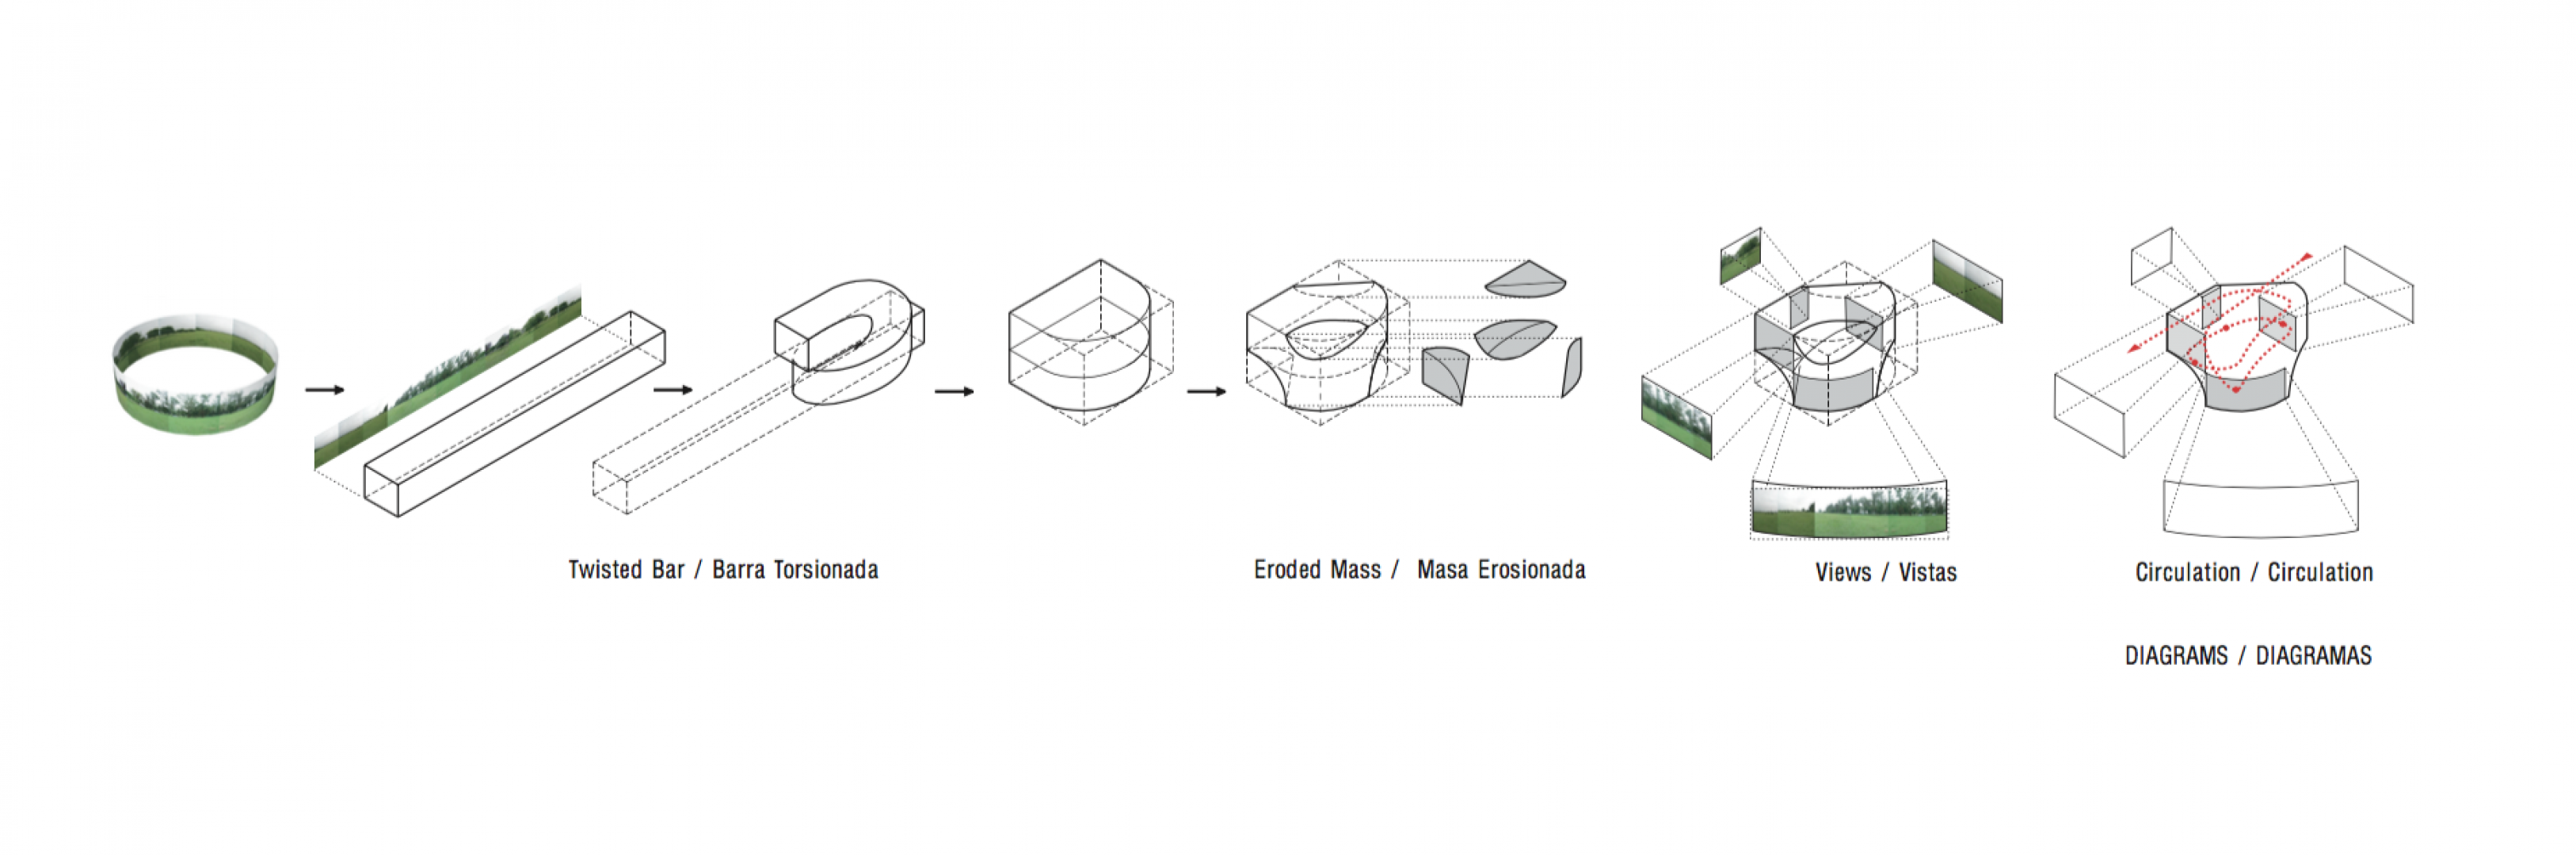 Home electrical wiring diagrams of sri lanka